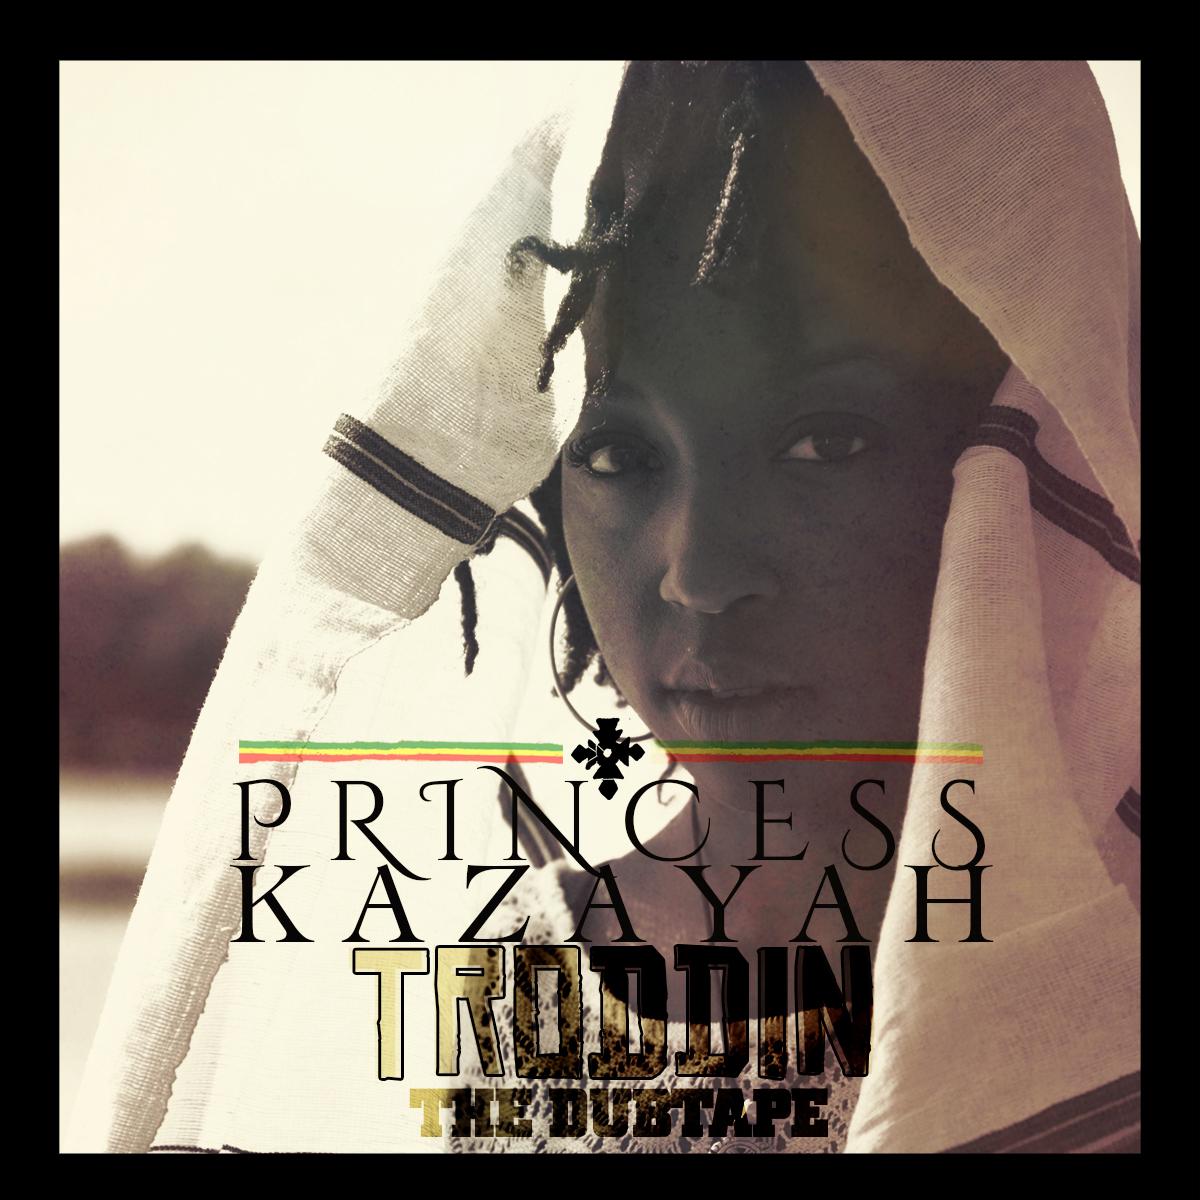 ARTWORK FRONT_Princess Kazayah_Troddin_The DubTape_2014